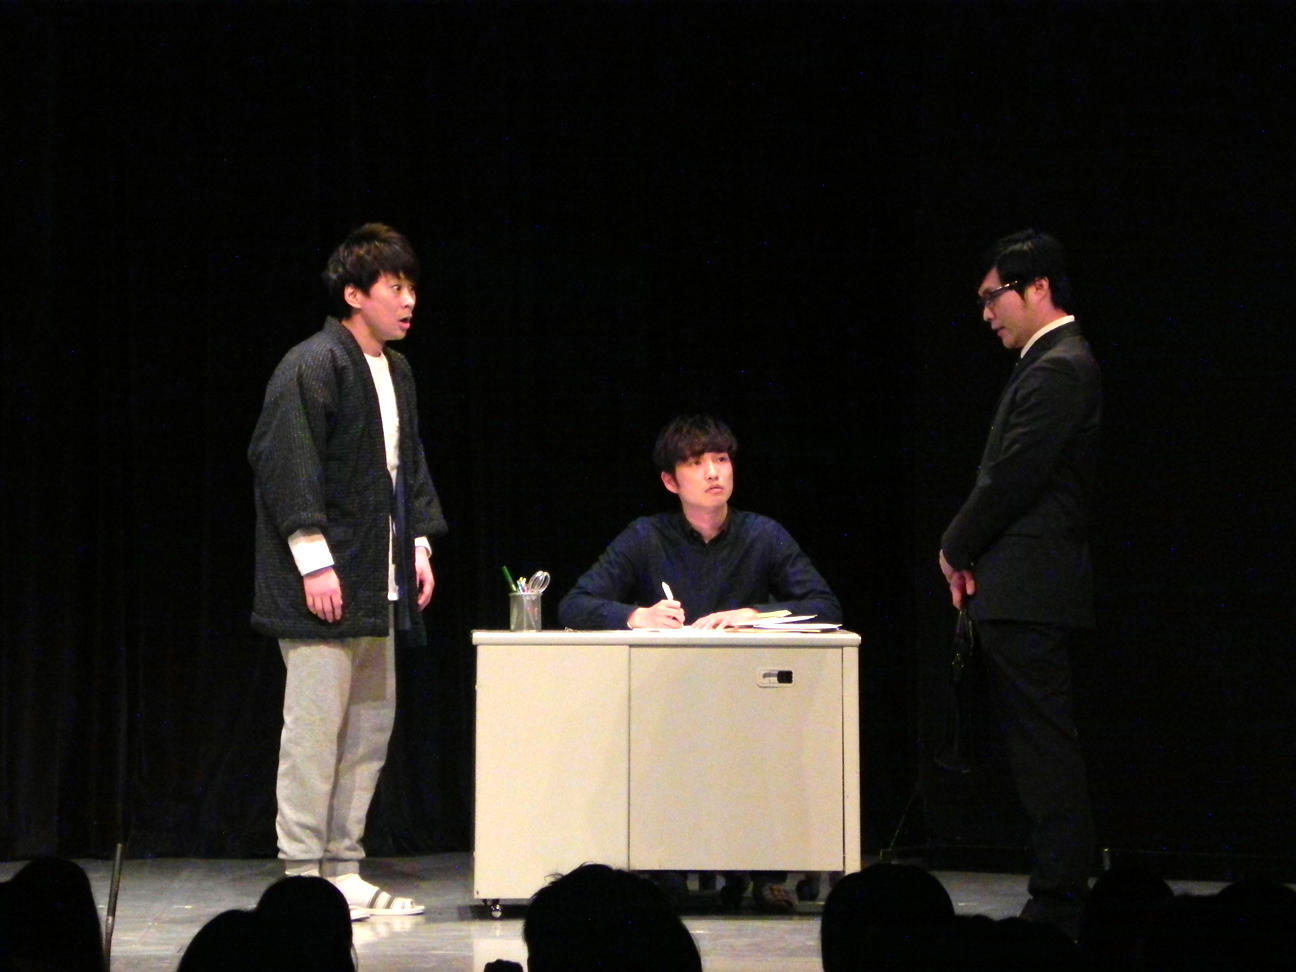 http://news.yoshimoto.co.jp/20170228123321-acca1c2009e00814eb5ac99be0bd94a3842704e9.jpg